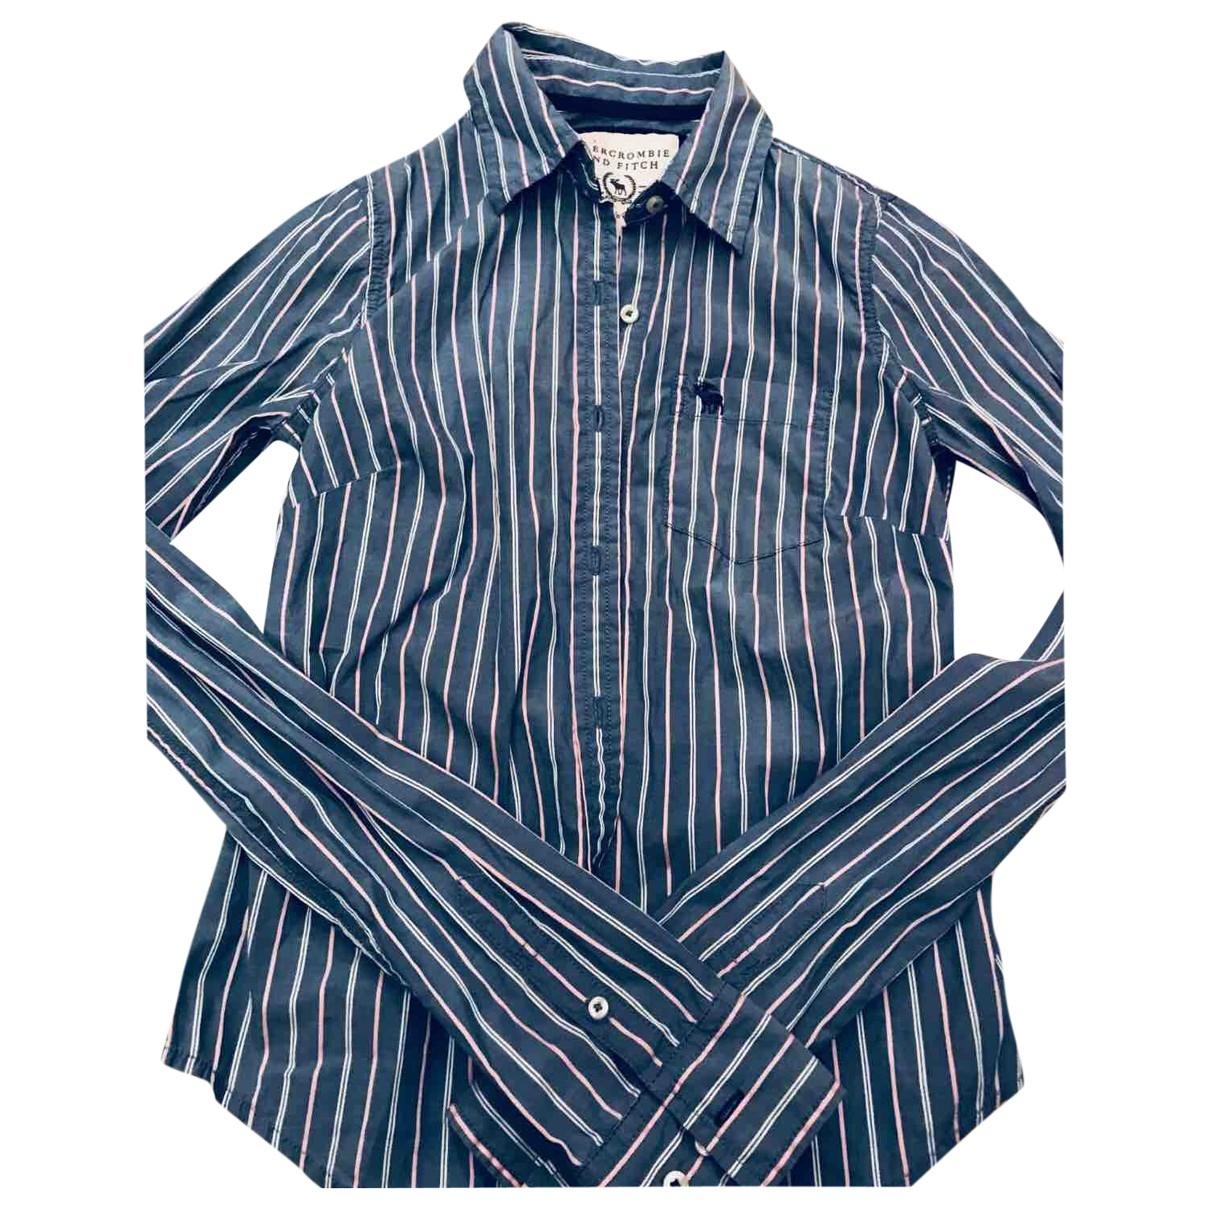 Abercrombie & Fitch \N Top in  Blau Baumwolle